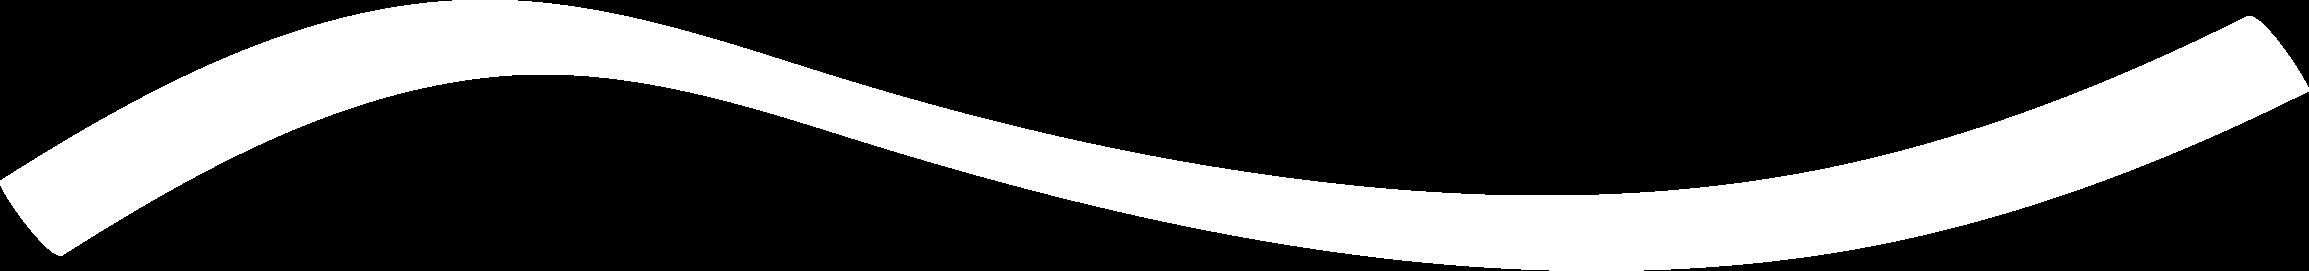 swoosh-white